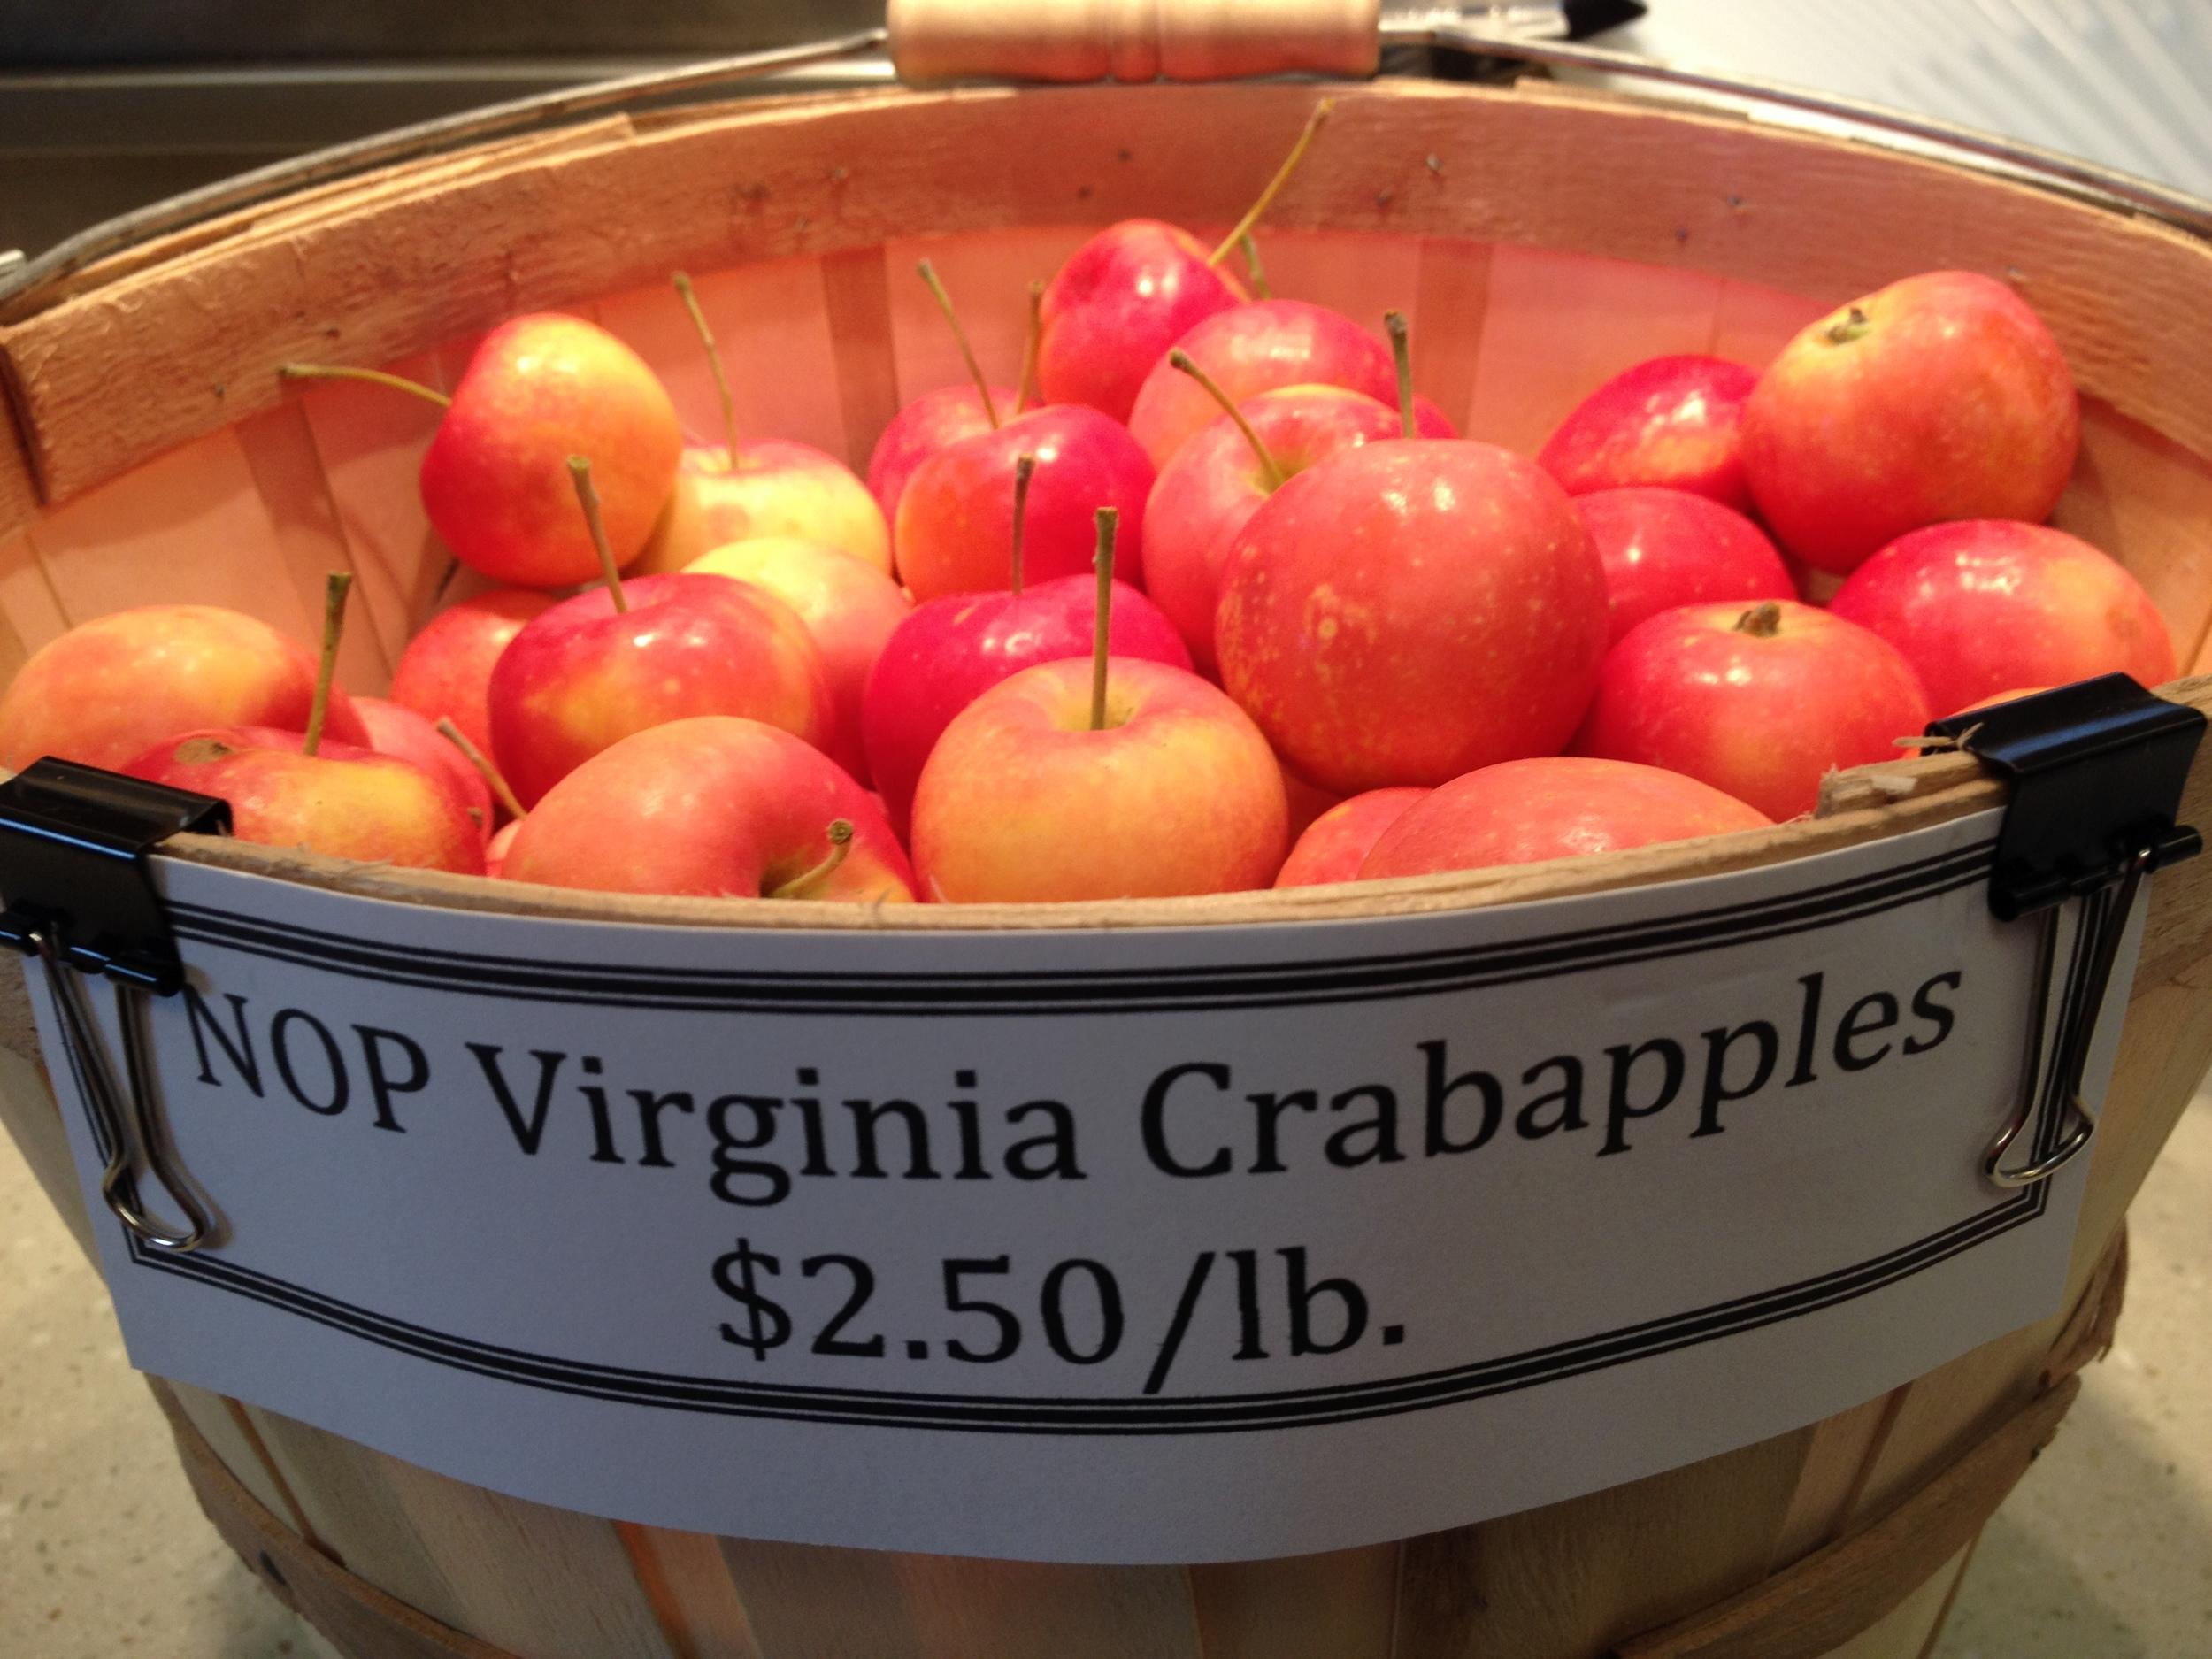 Virginia Crab Apples Grown According to National Organic Protocol (NOP)